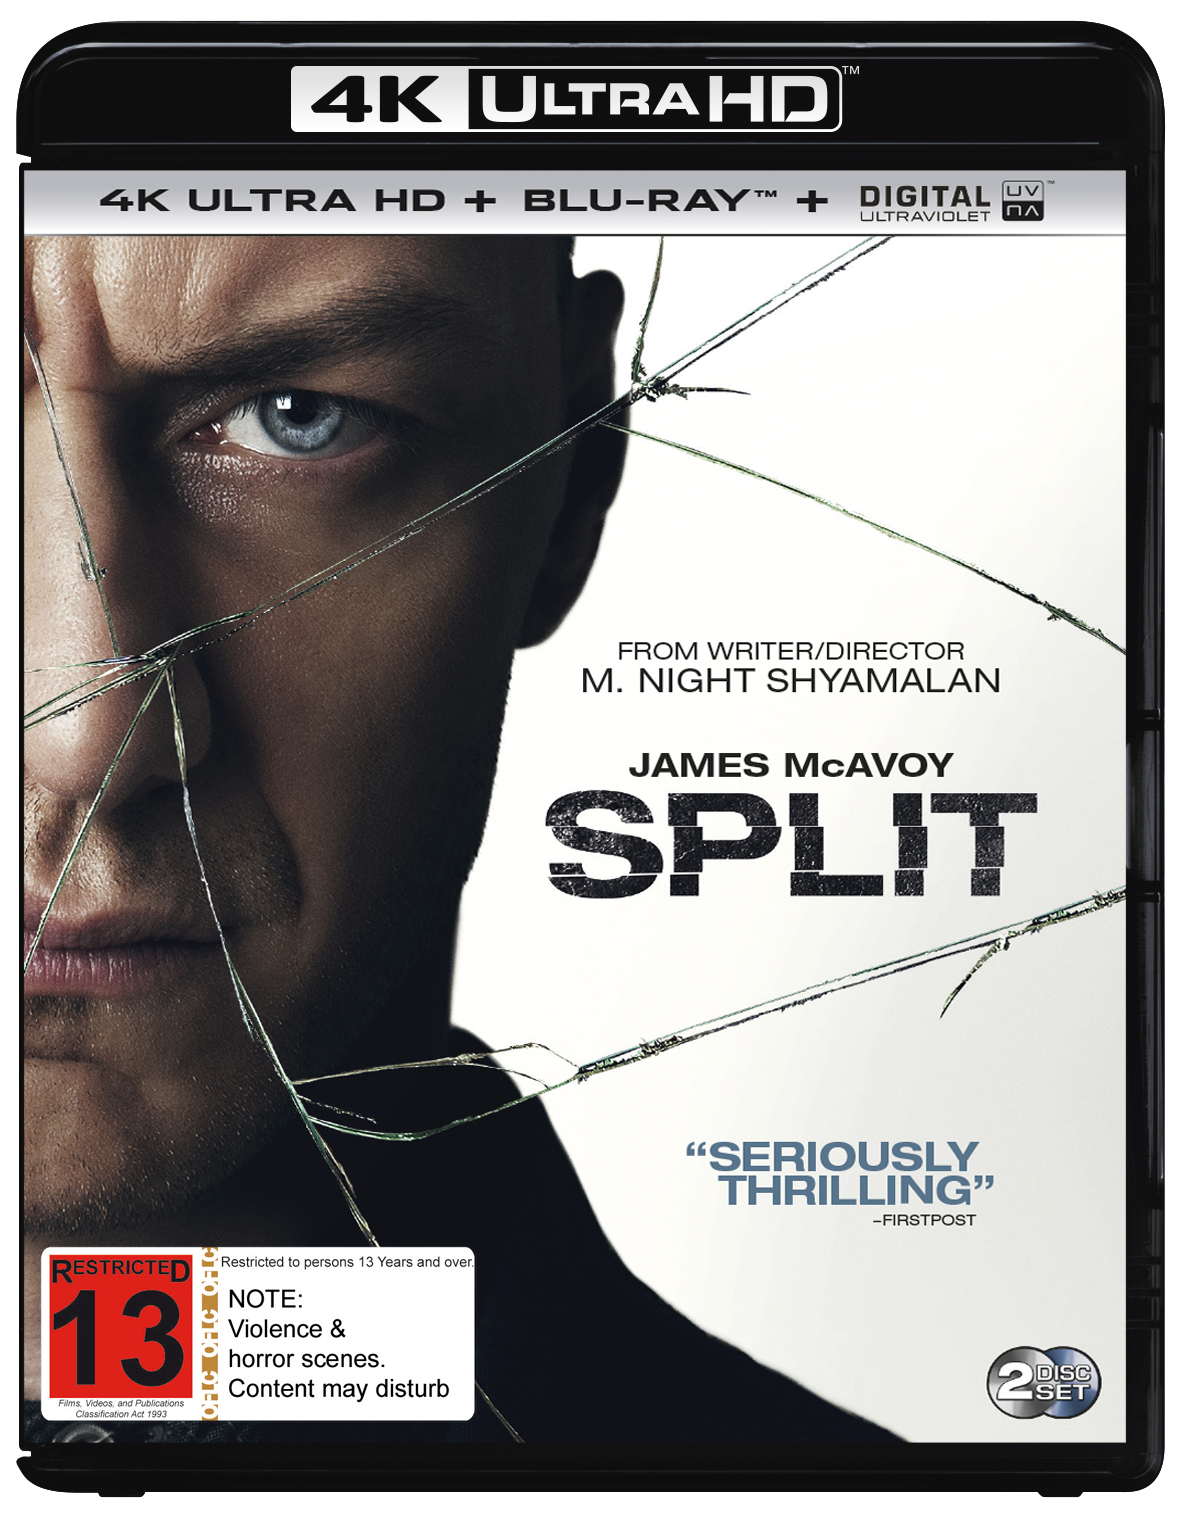 Split on Blu-ray, UHD Blu-ray image